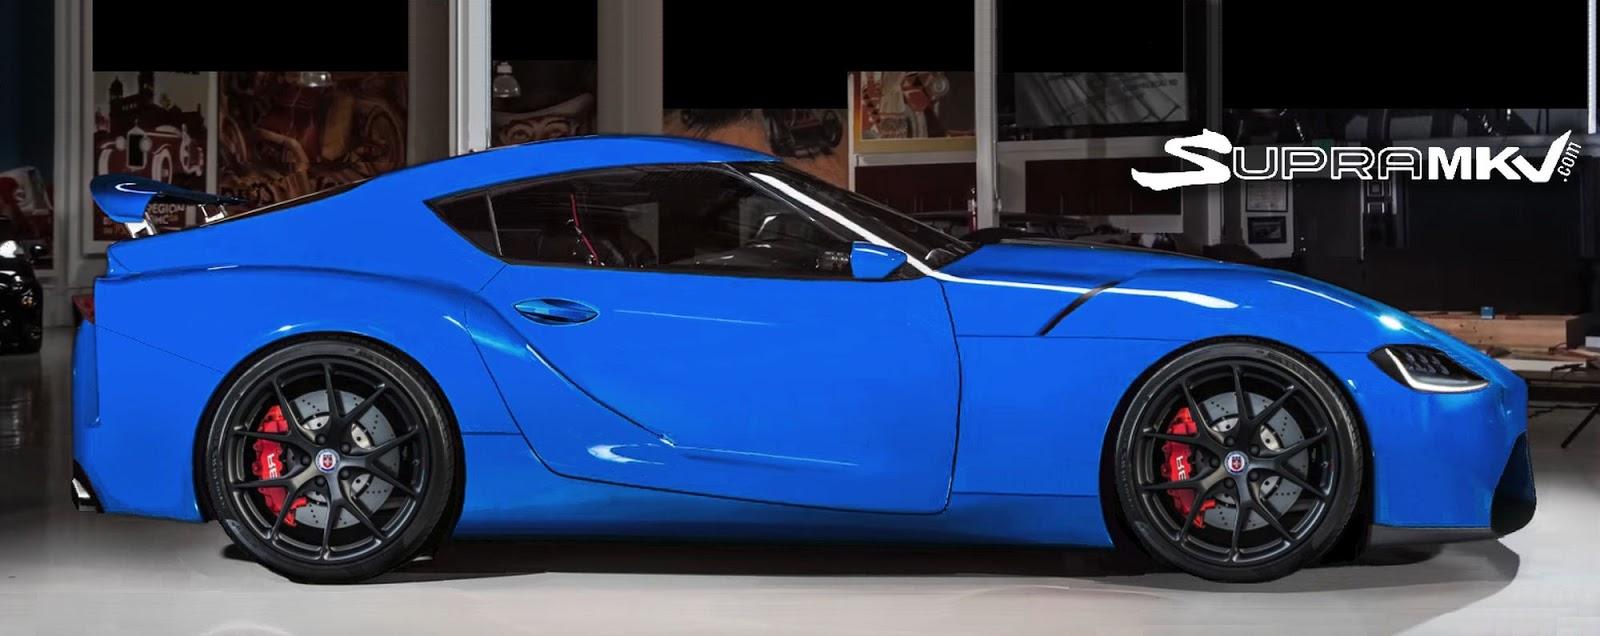 Toyota-Supra-Rendering-1